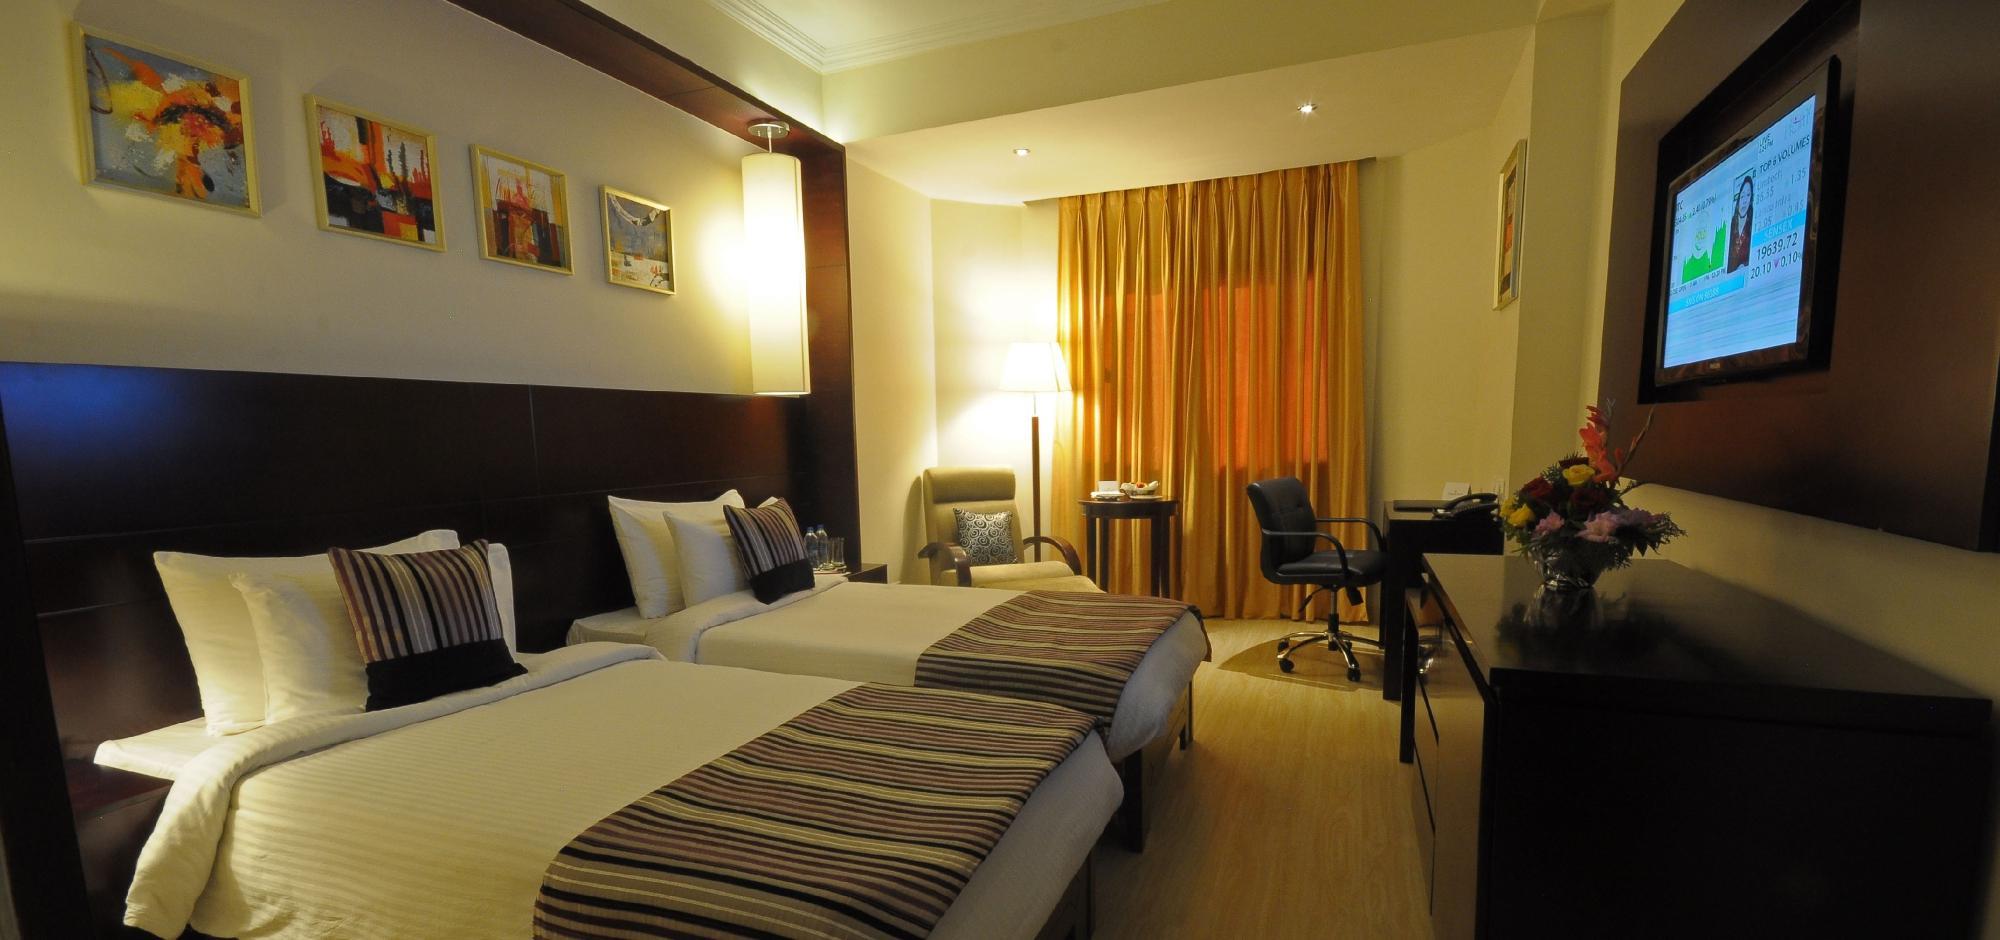 Golden Tulip Udaipur Hotels Rajasthan Tour Travel Voucher Hotel Royal